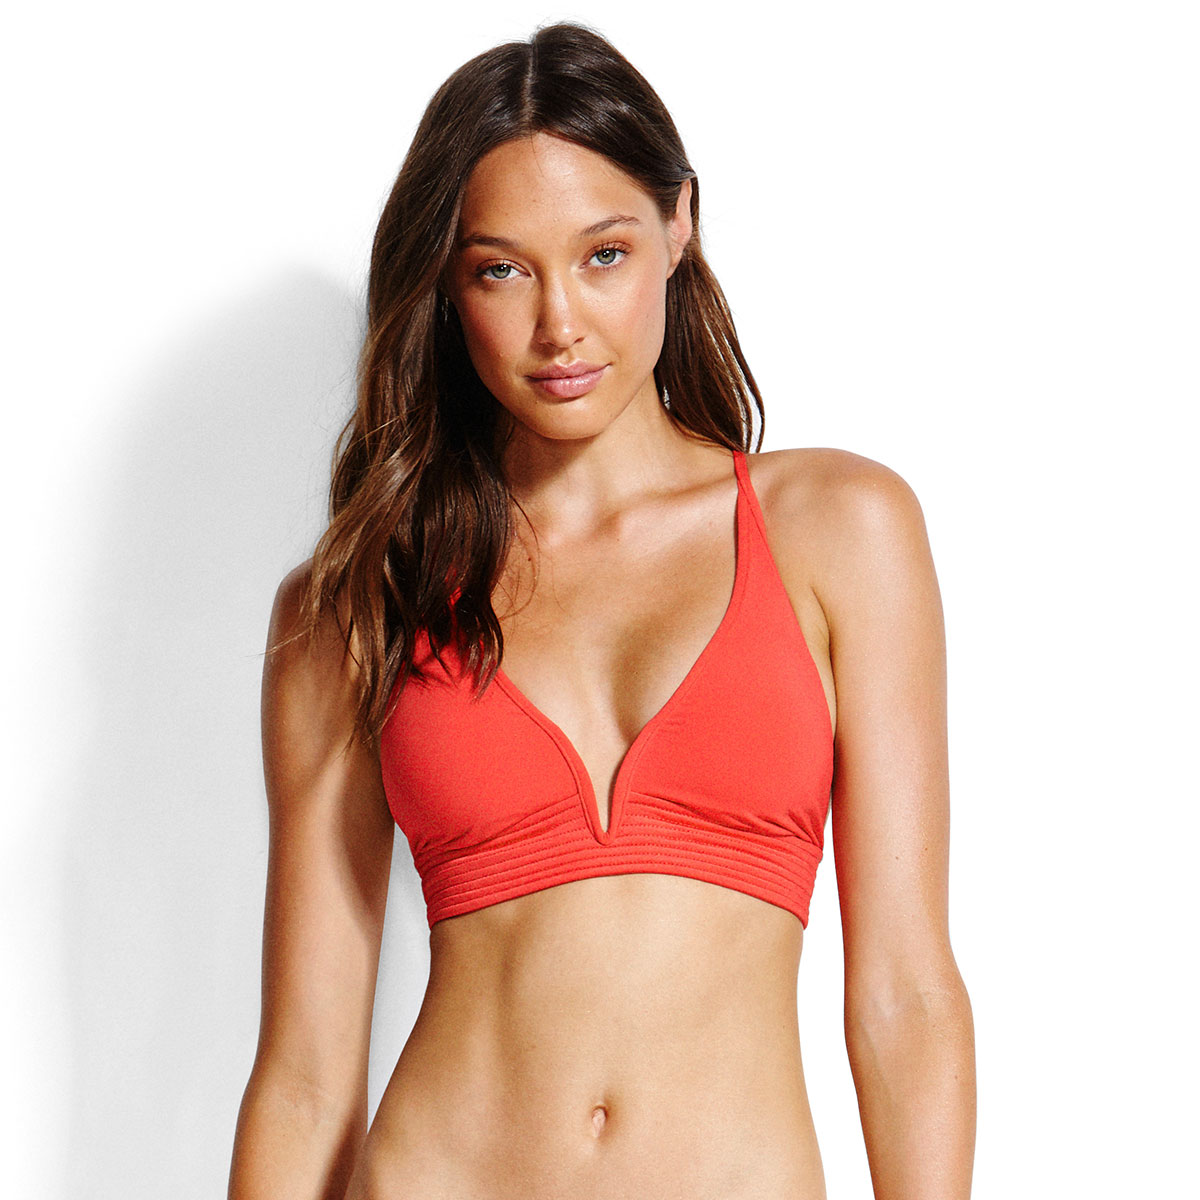 Haut de maillot de bain triangle rouge Seafolly